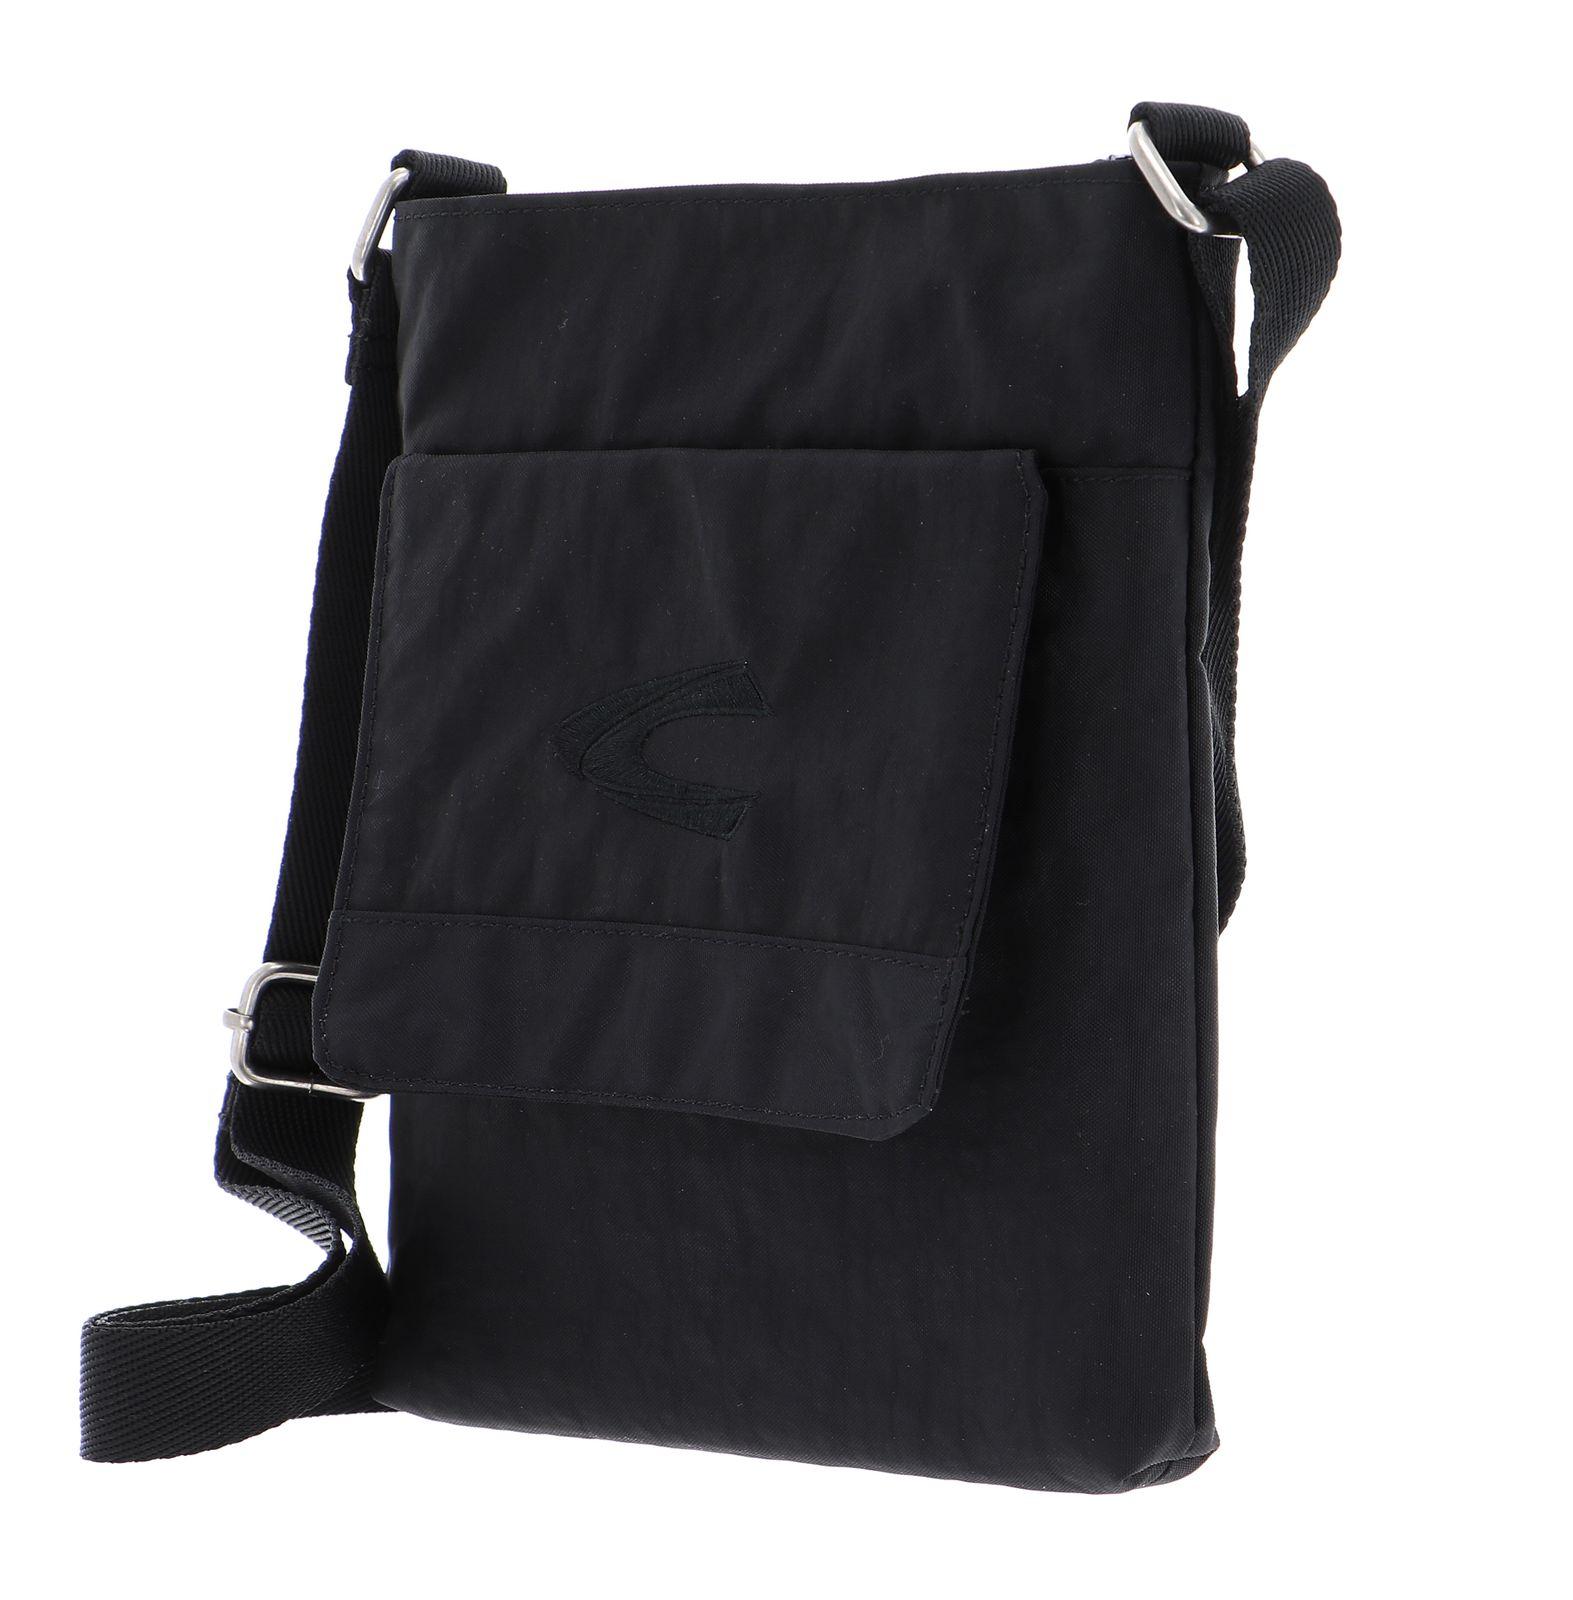 Camel Active Shoulderbag Tasche Schultertasche Journey S Schwarz Black